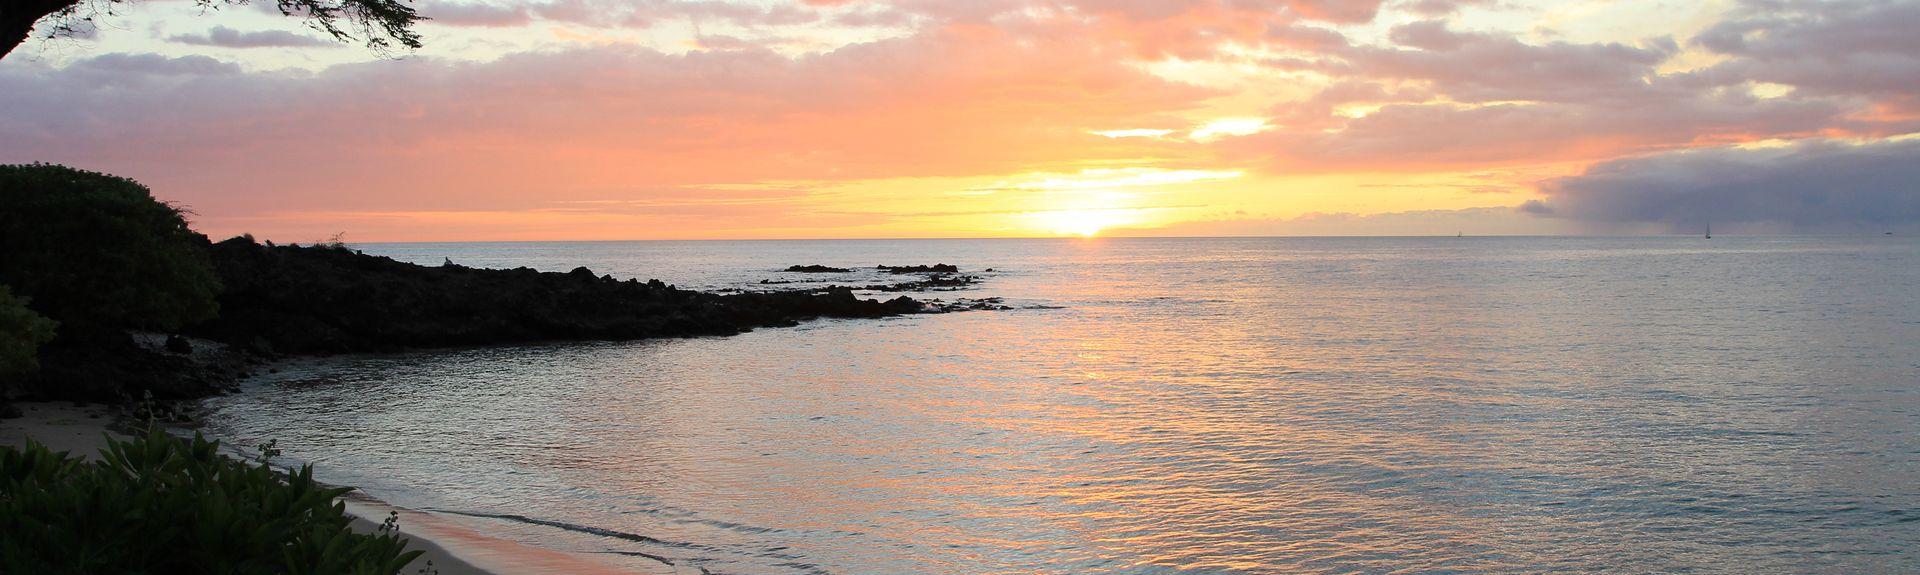 Waipio Valley Lookout, Honokaa, Hawaii, United States of America